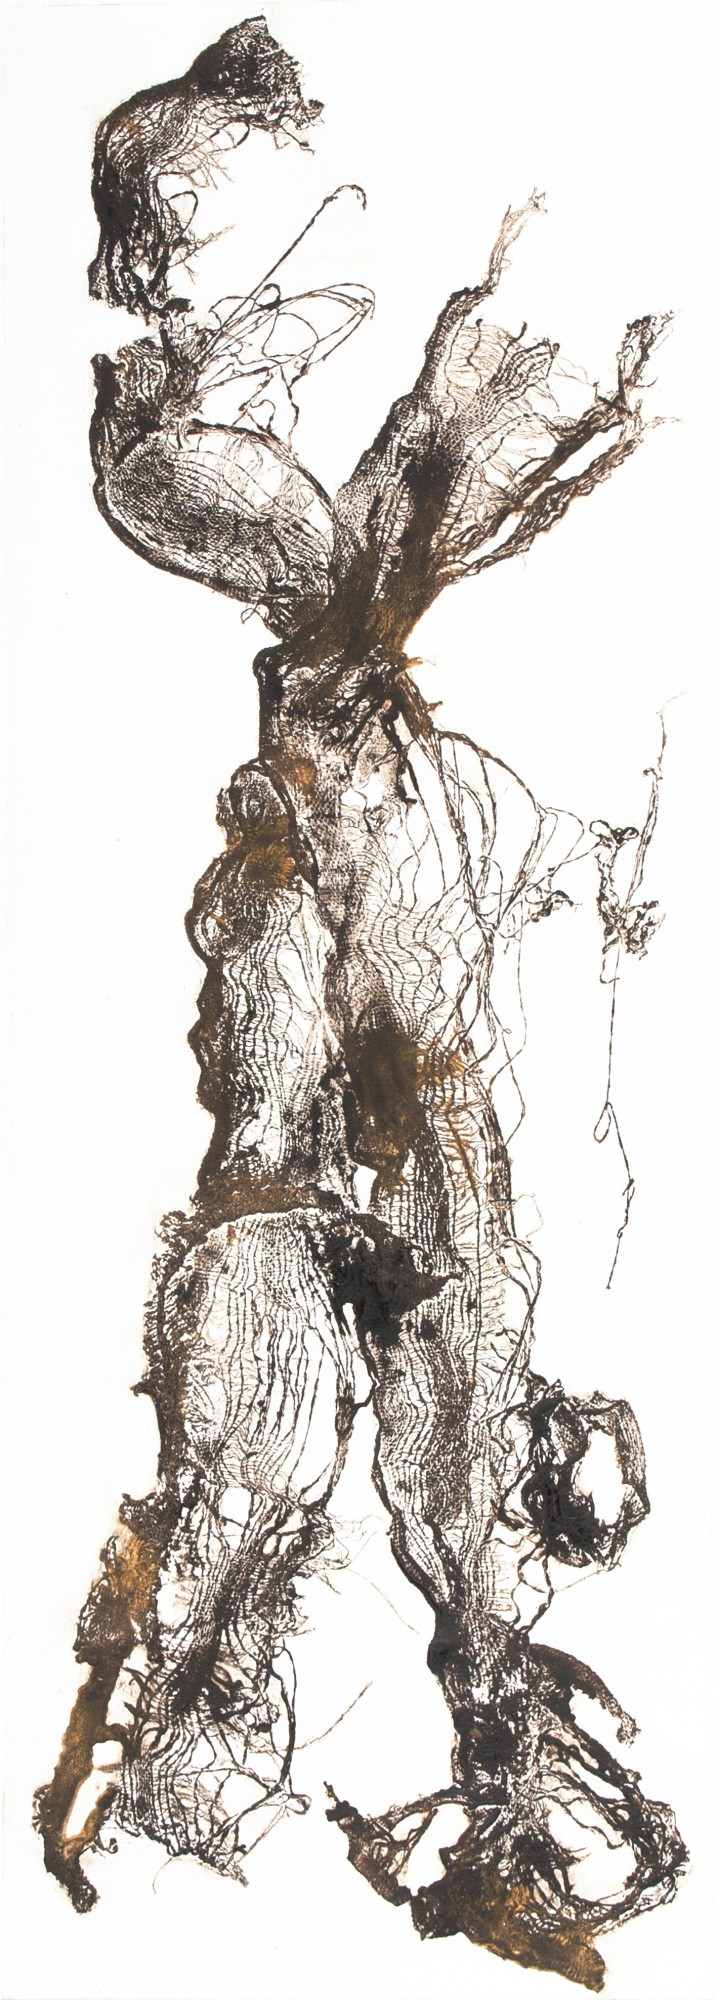 Sinclair Ashman: 'Motion I'. Collagraph print.